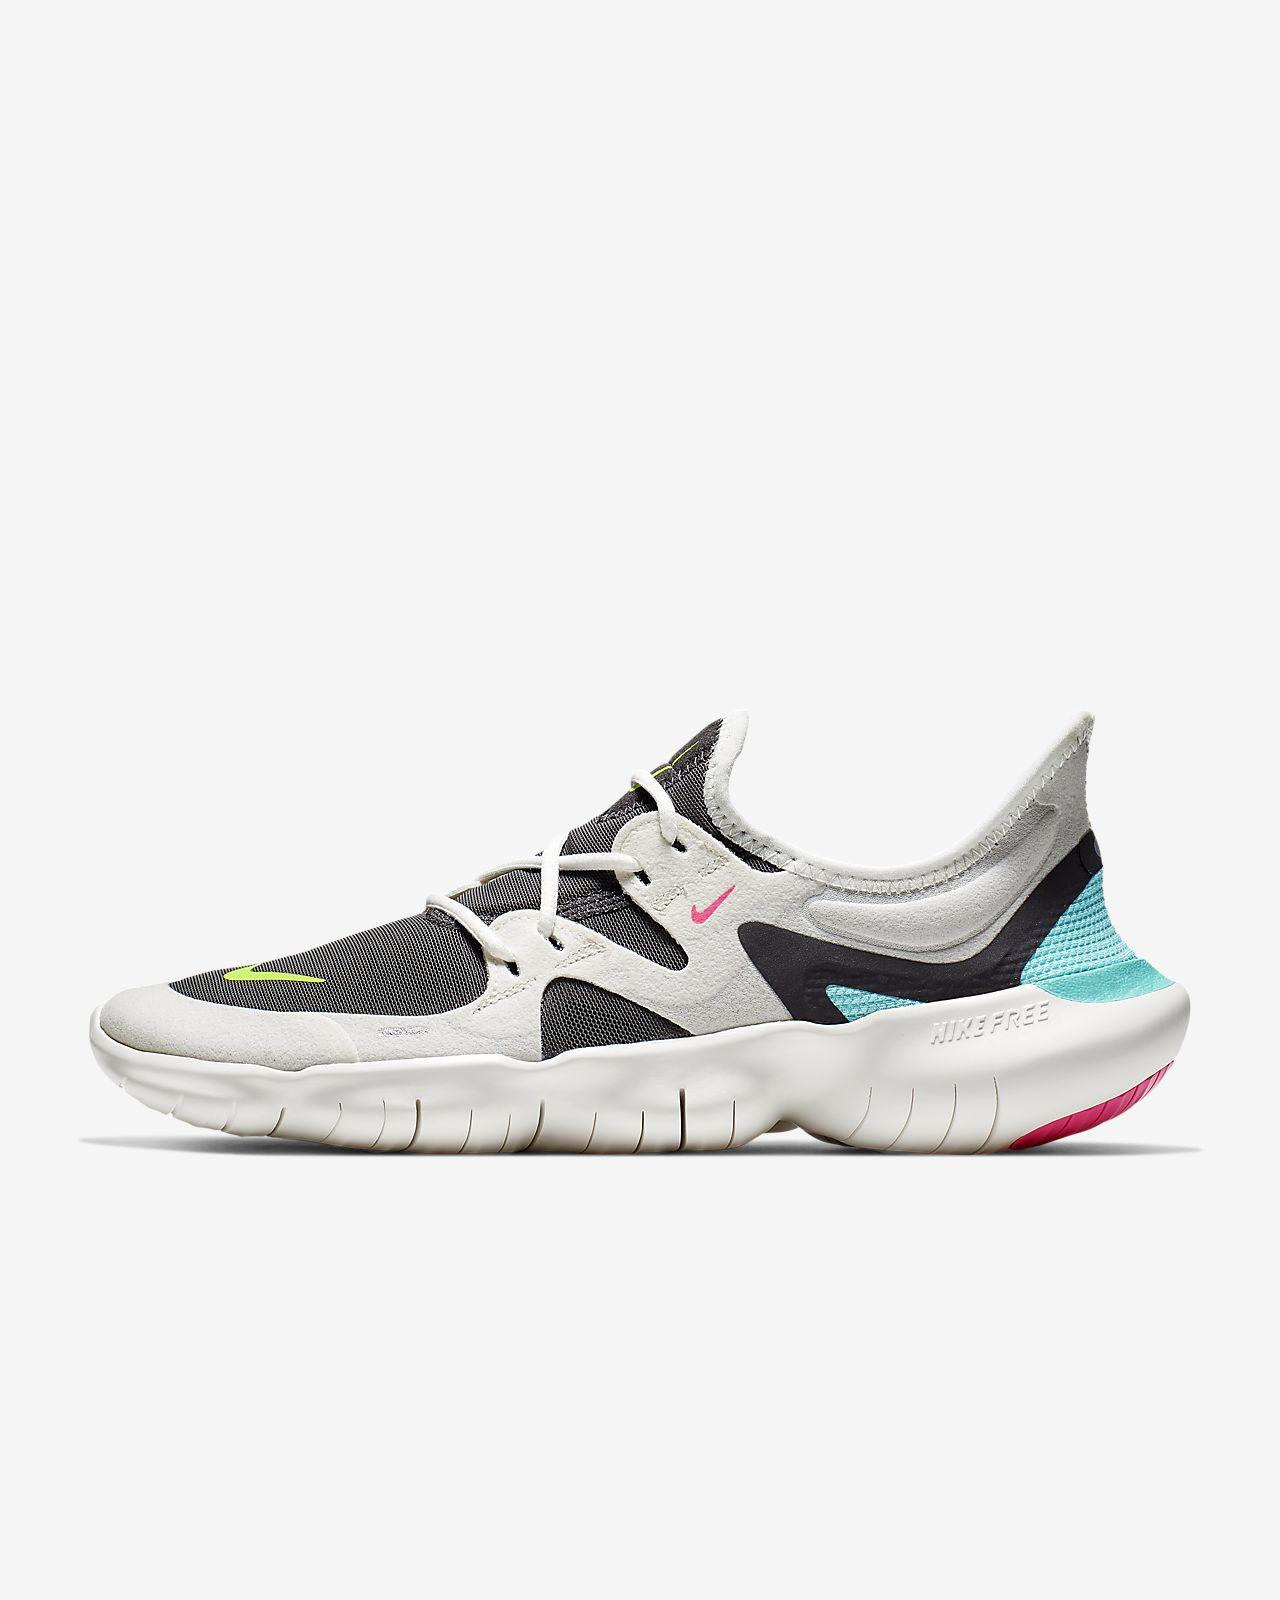 6da67fb0 Женские беговые кроссовки Nike Free RN 5.0. Nike.com RU